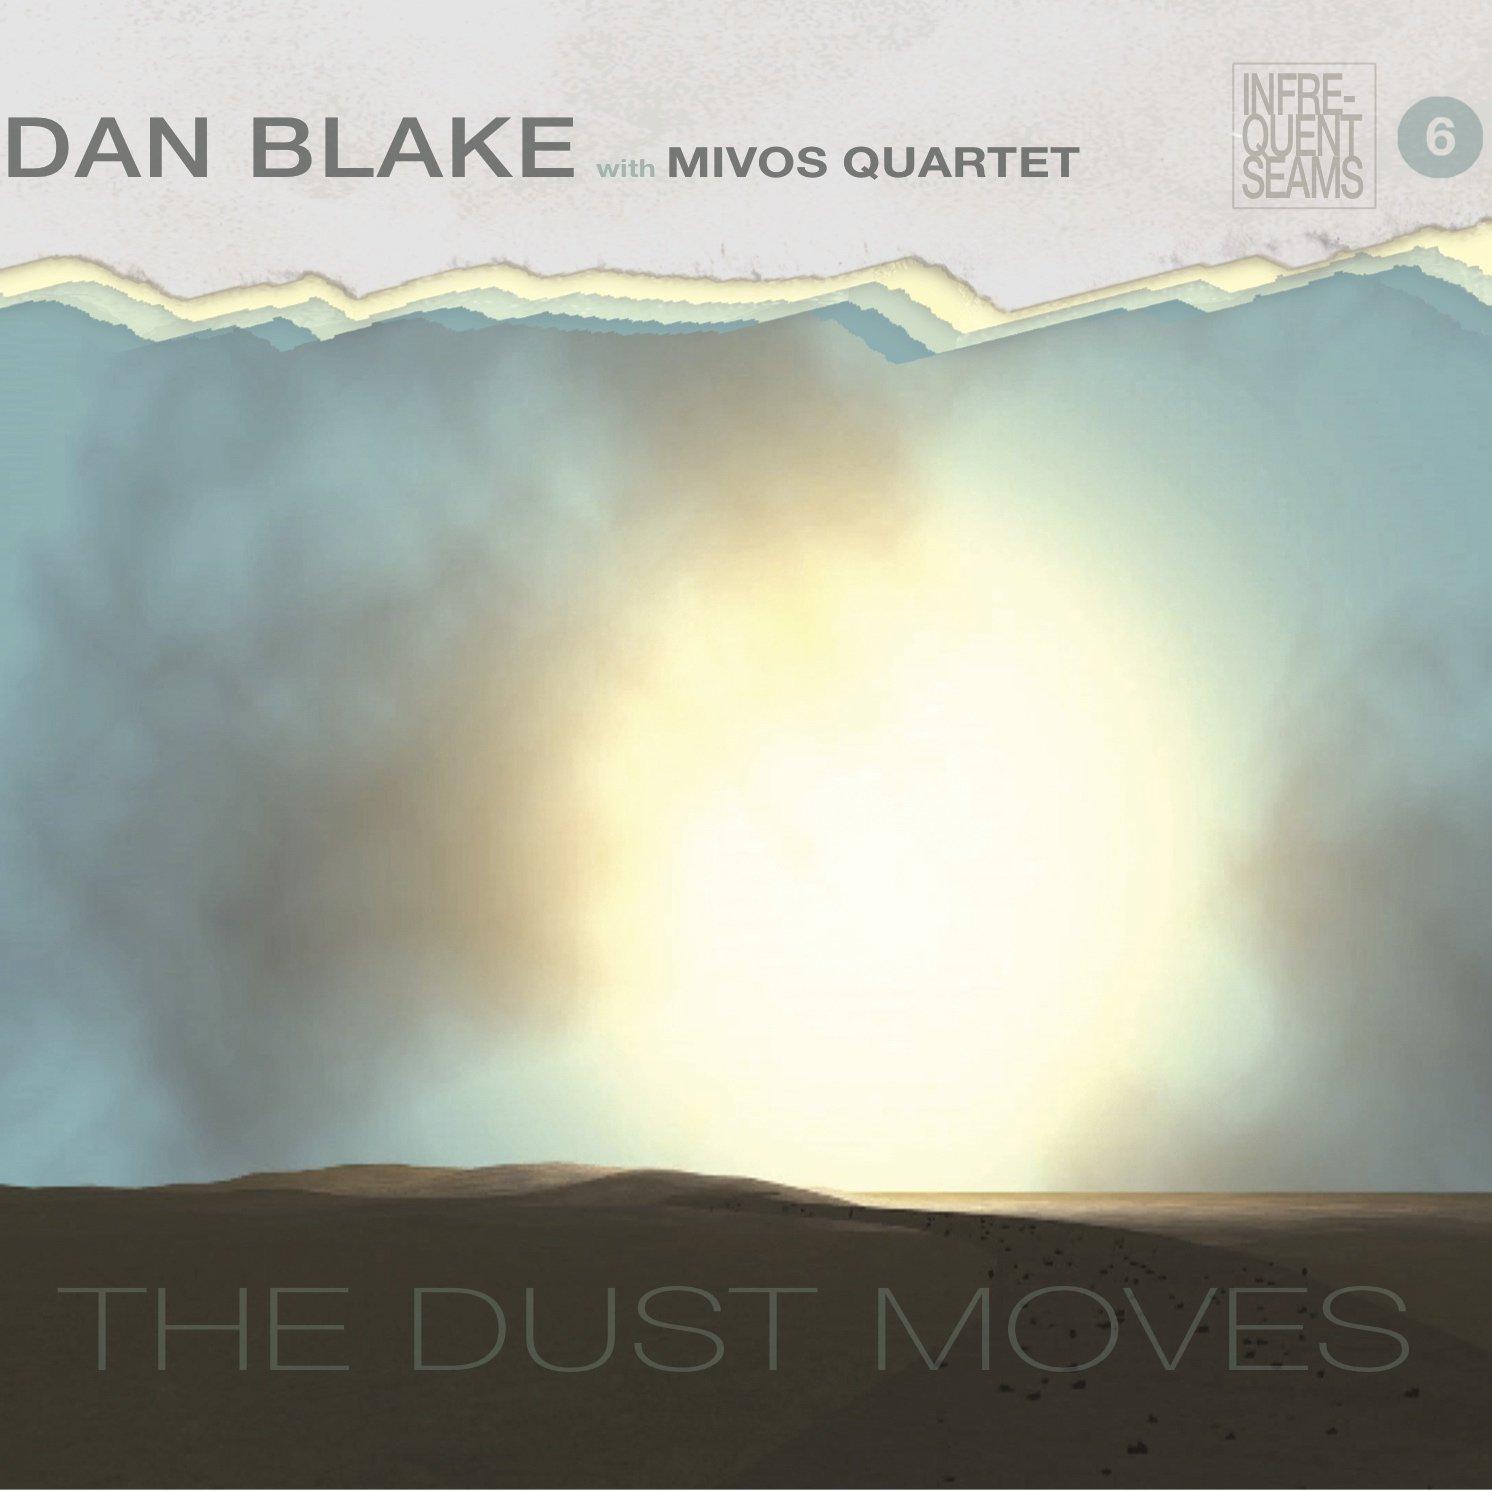 DVD : DAN BLAKE & MIVOS QUARTET - Dust Moves (Digital Download Card)